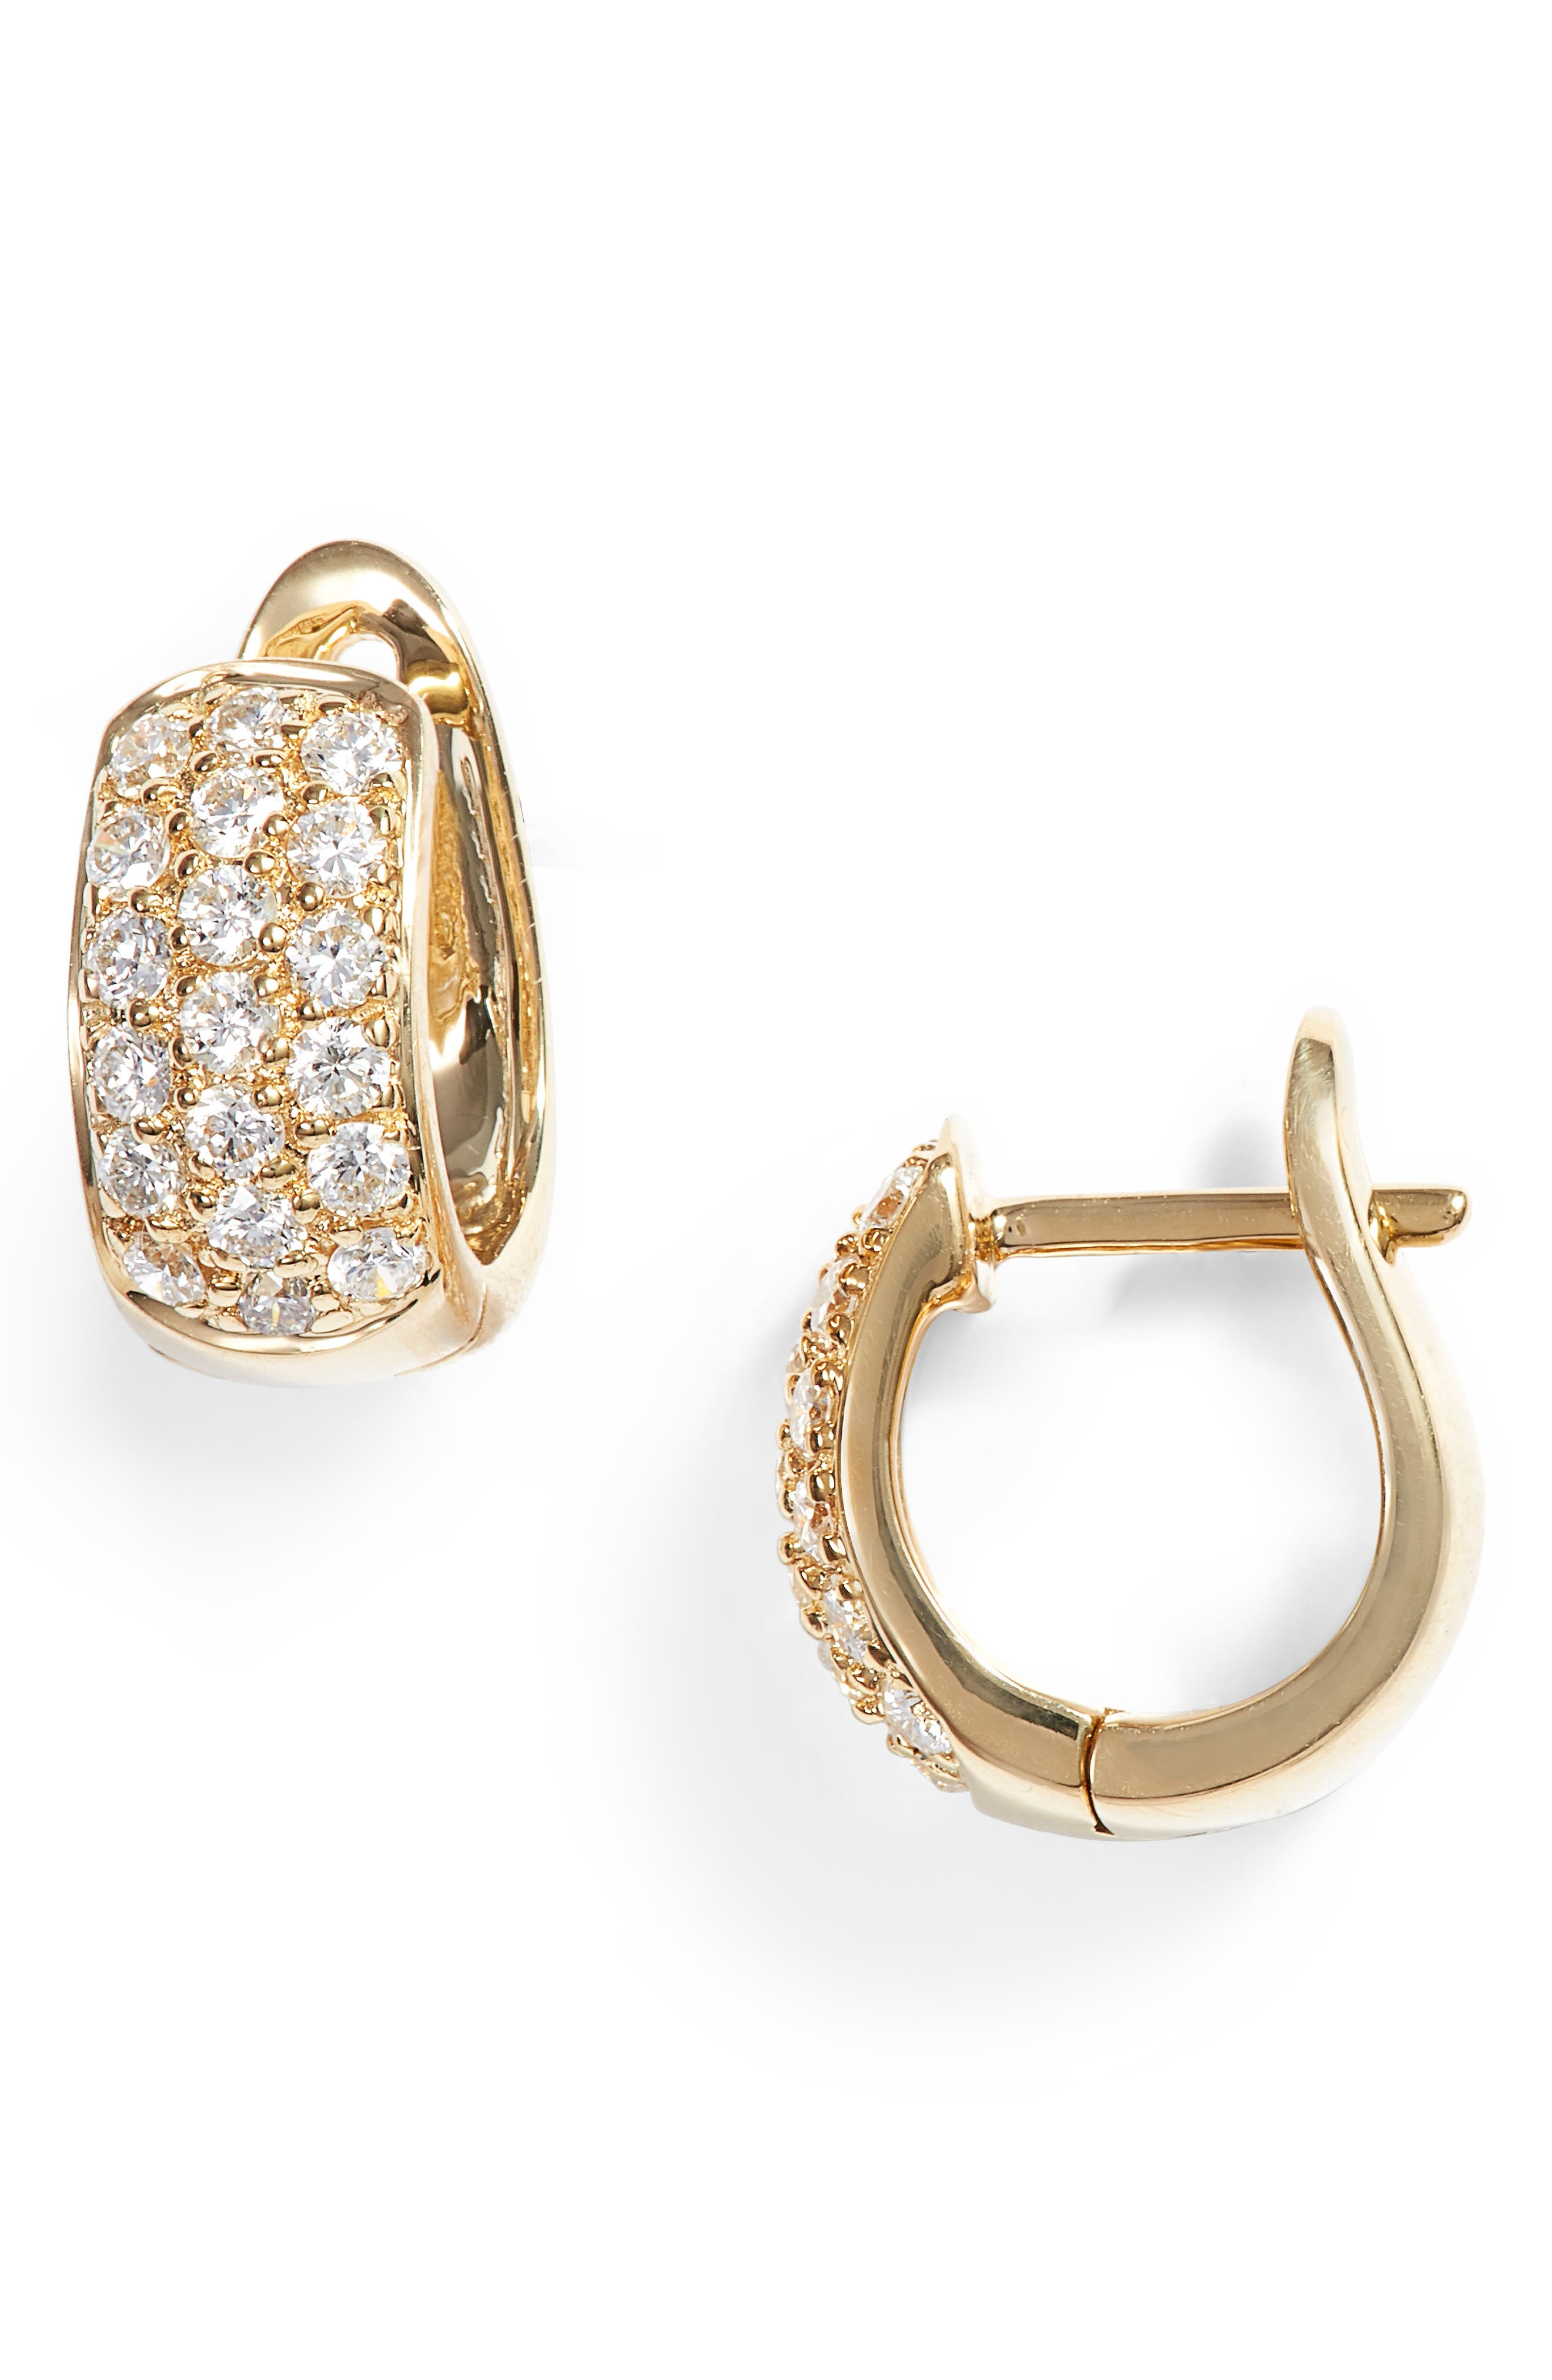 Dana Rebecca Mini Diamond Hoop Earrings,                         Main,                         color, YELLOW GOLD